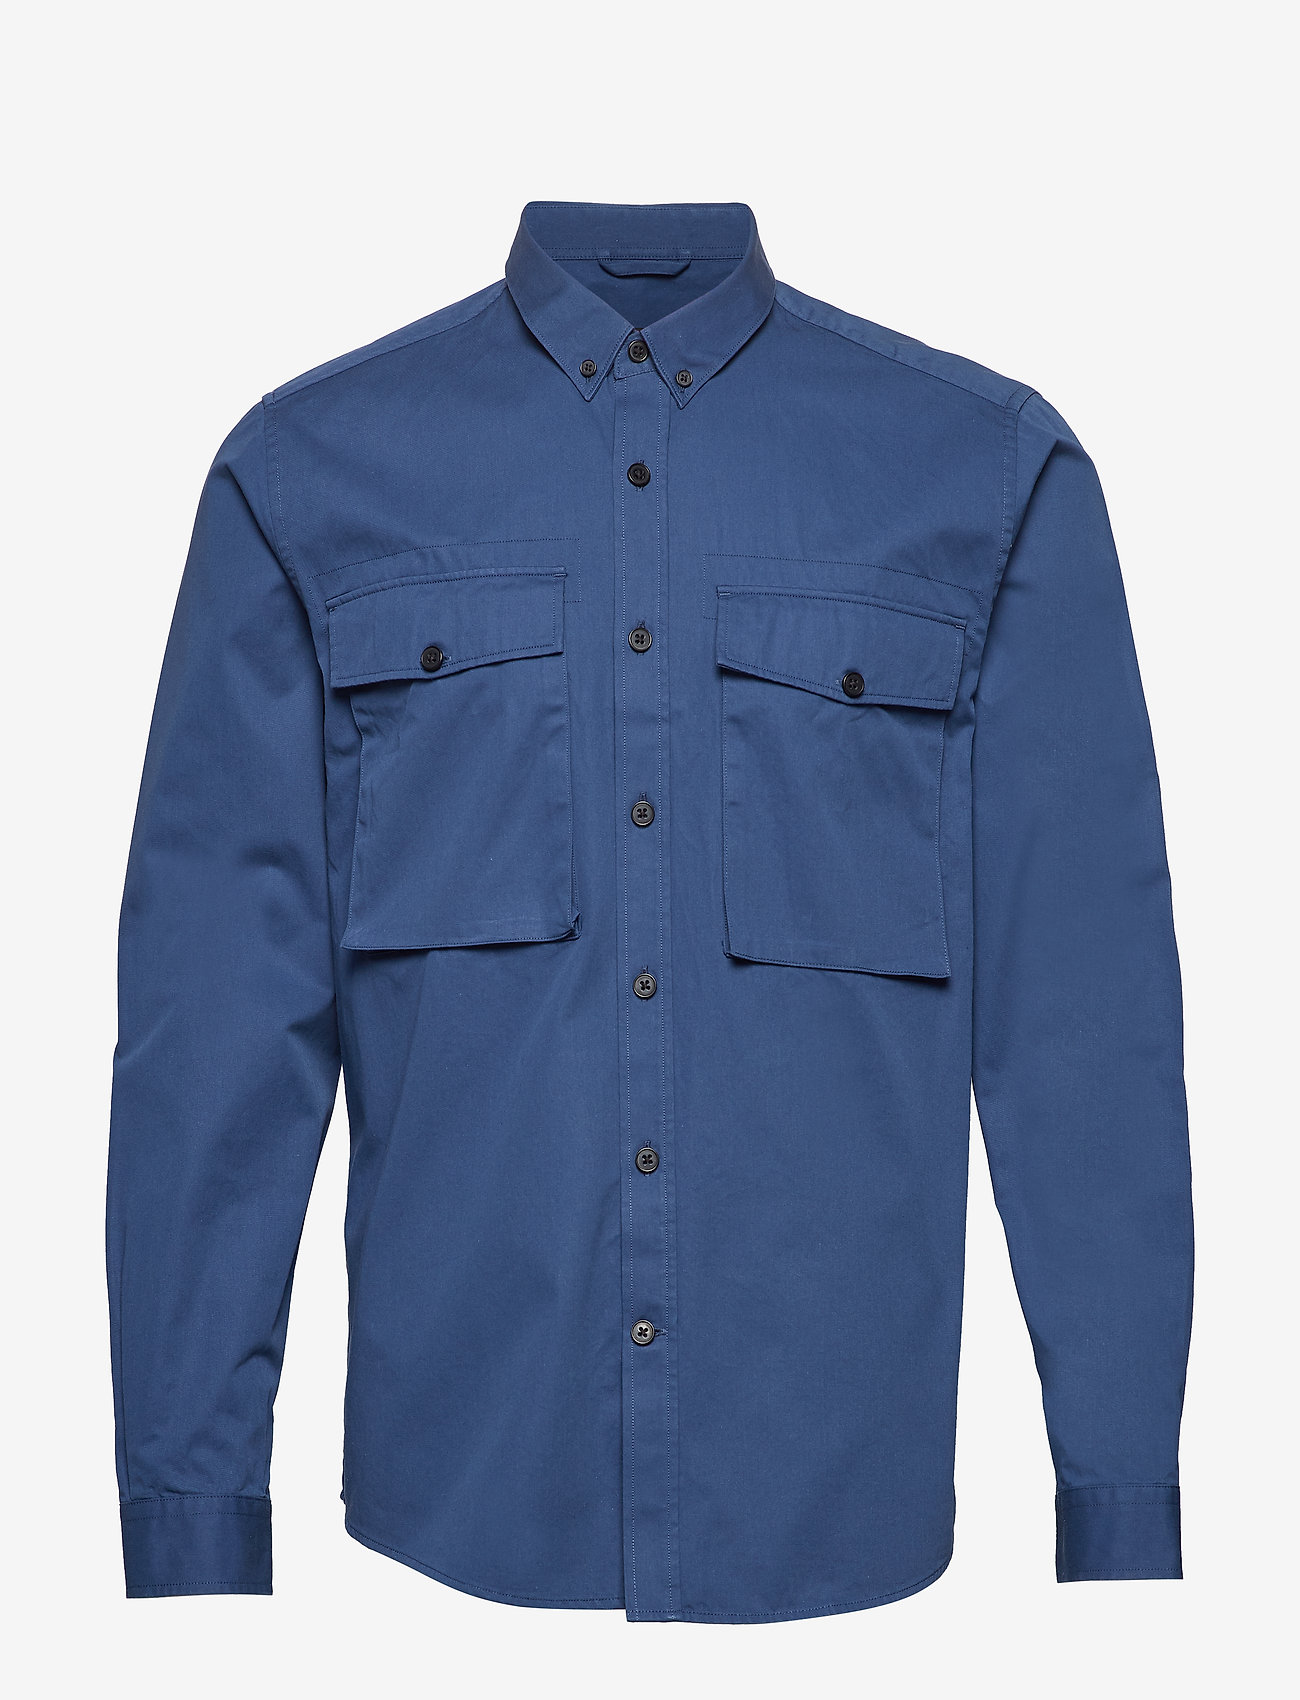 Peak Performance - DEAN MILIS - denim overhemden - decent blue - 0